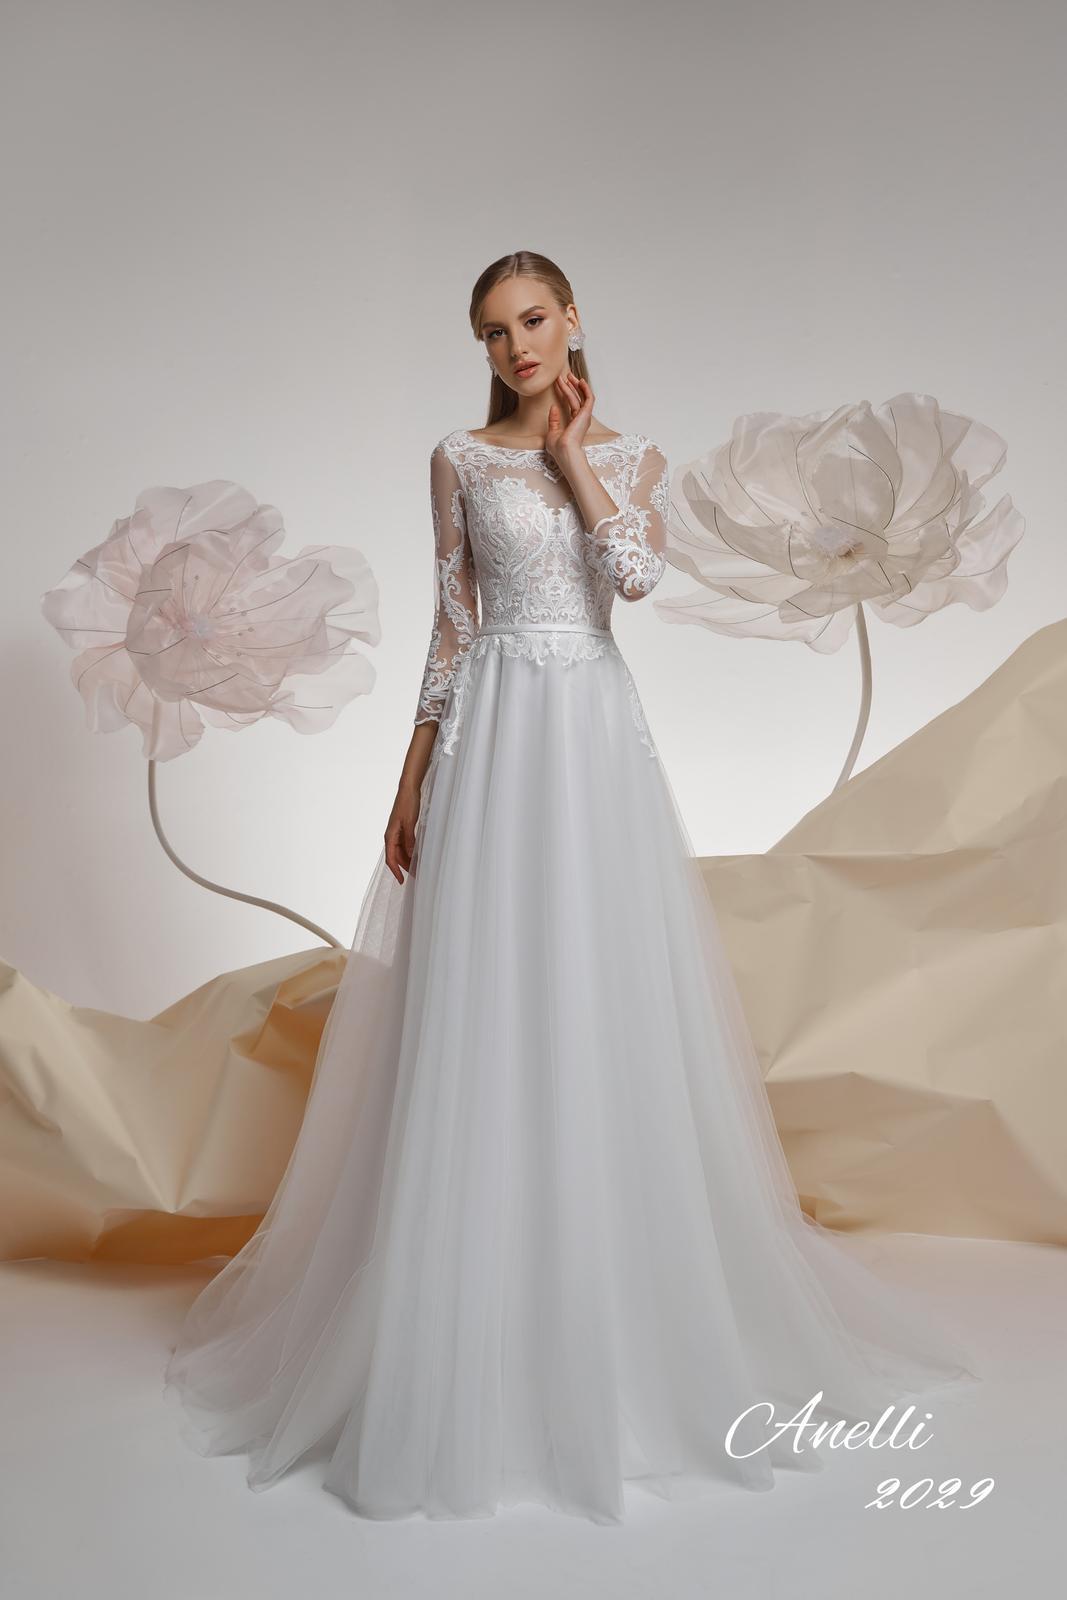 Svadobné šaty - Imagine 2029 - Obrázok č. 1